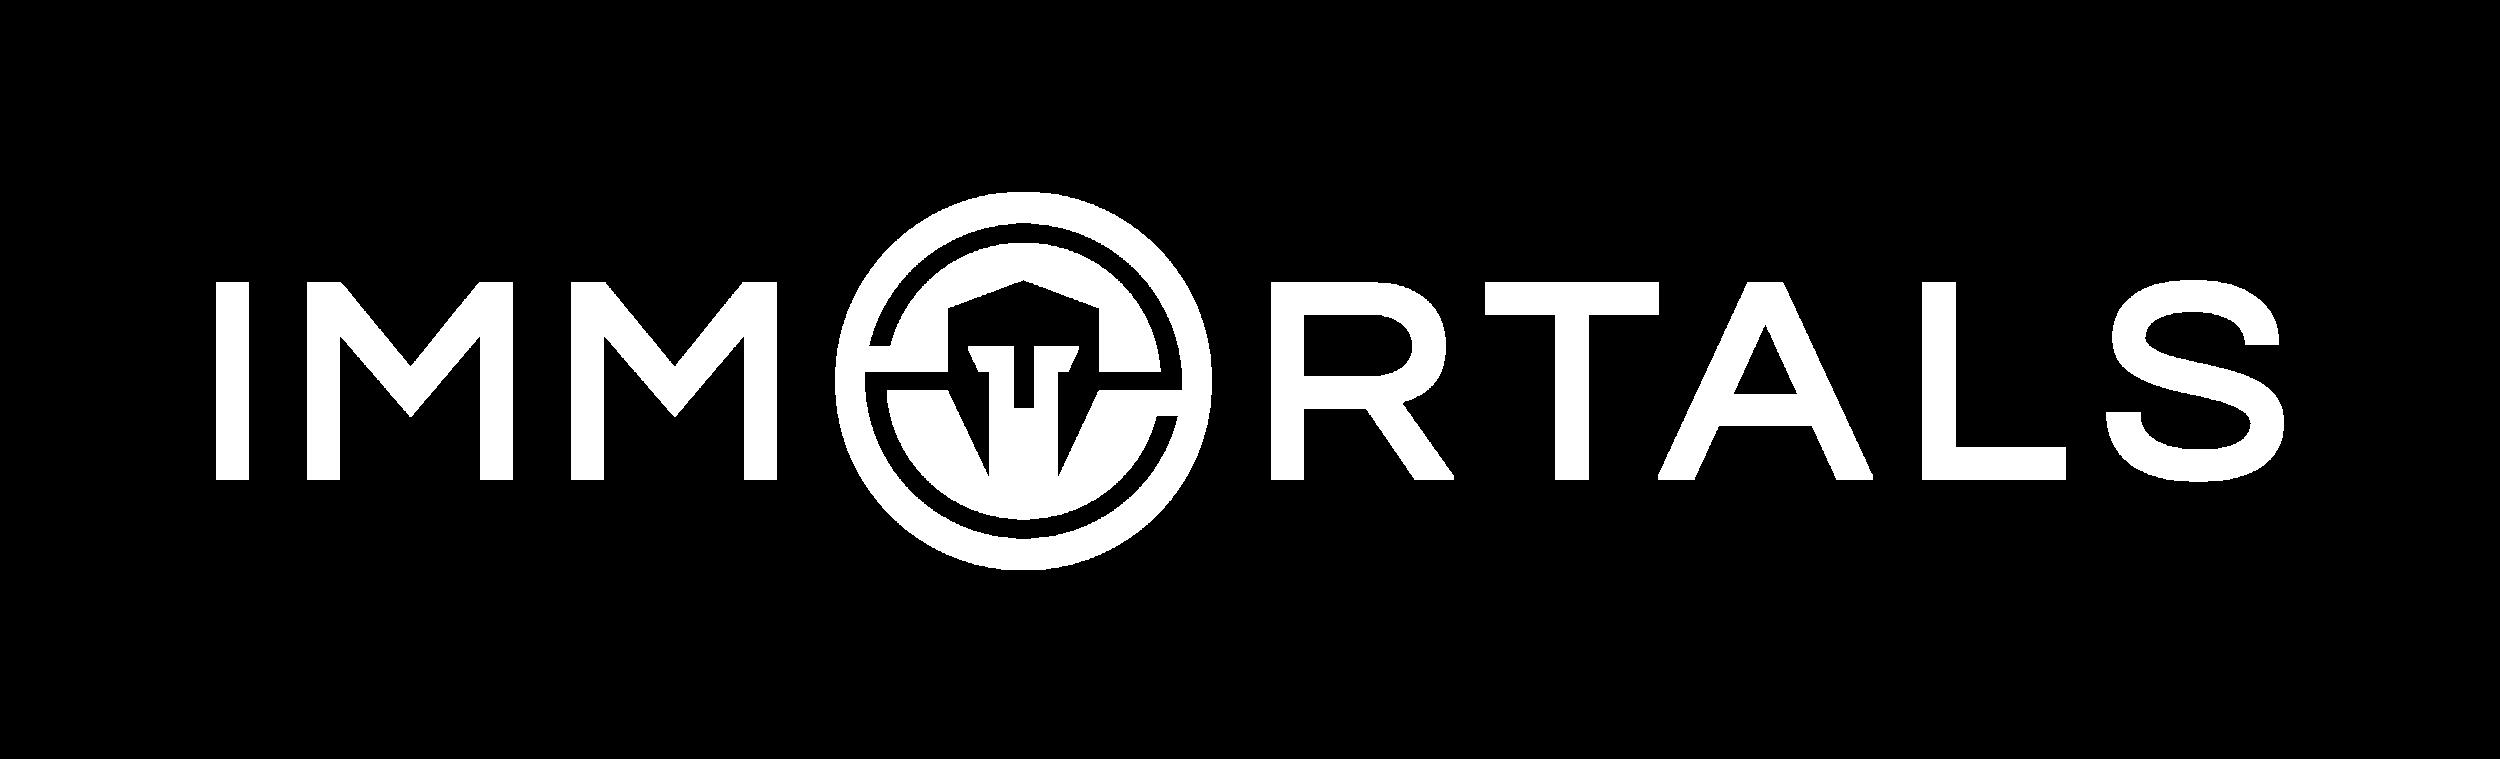 Immortals-2015-Logo-White-Cutout.png